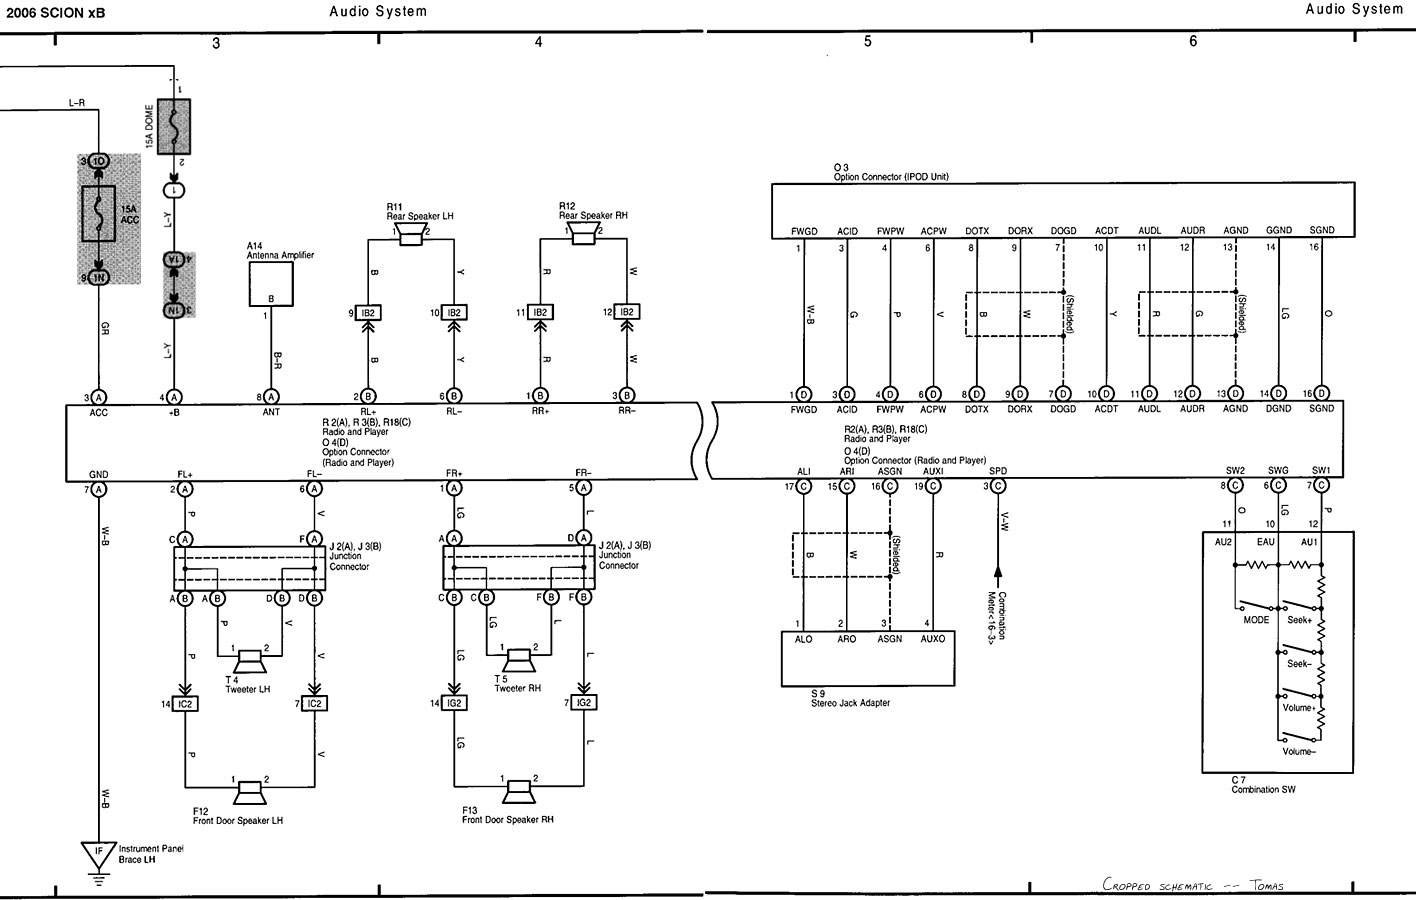 Wiring Diagrams Audio Wiring Diagrams Stereoaudiowiringdiagrams